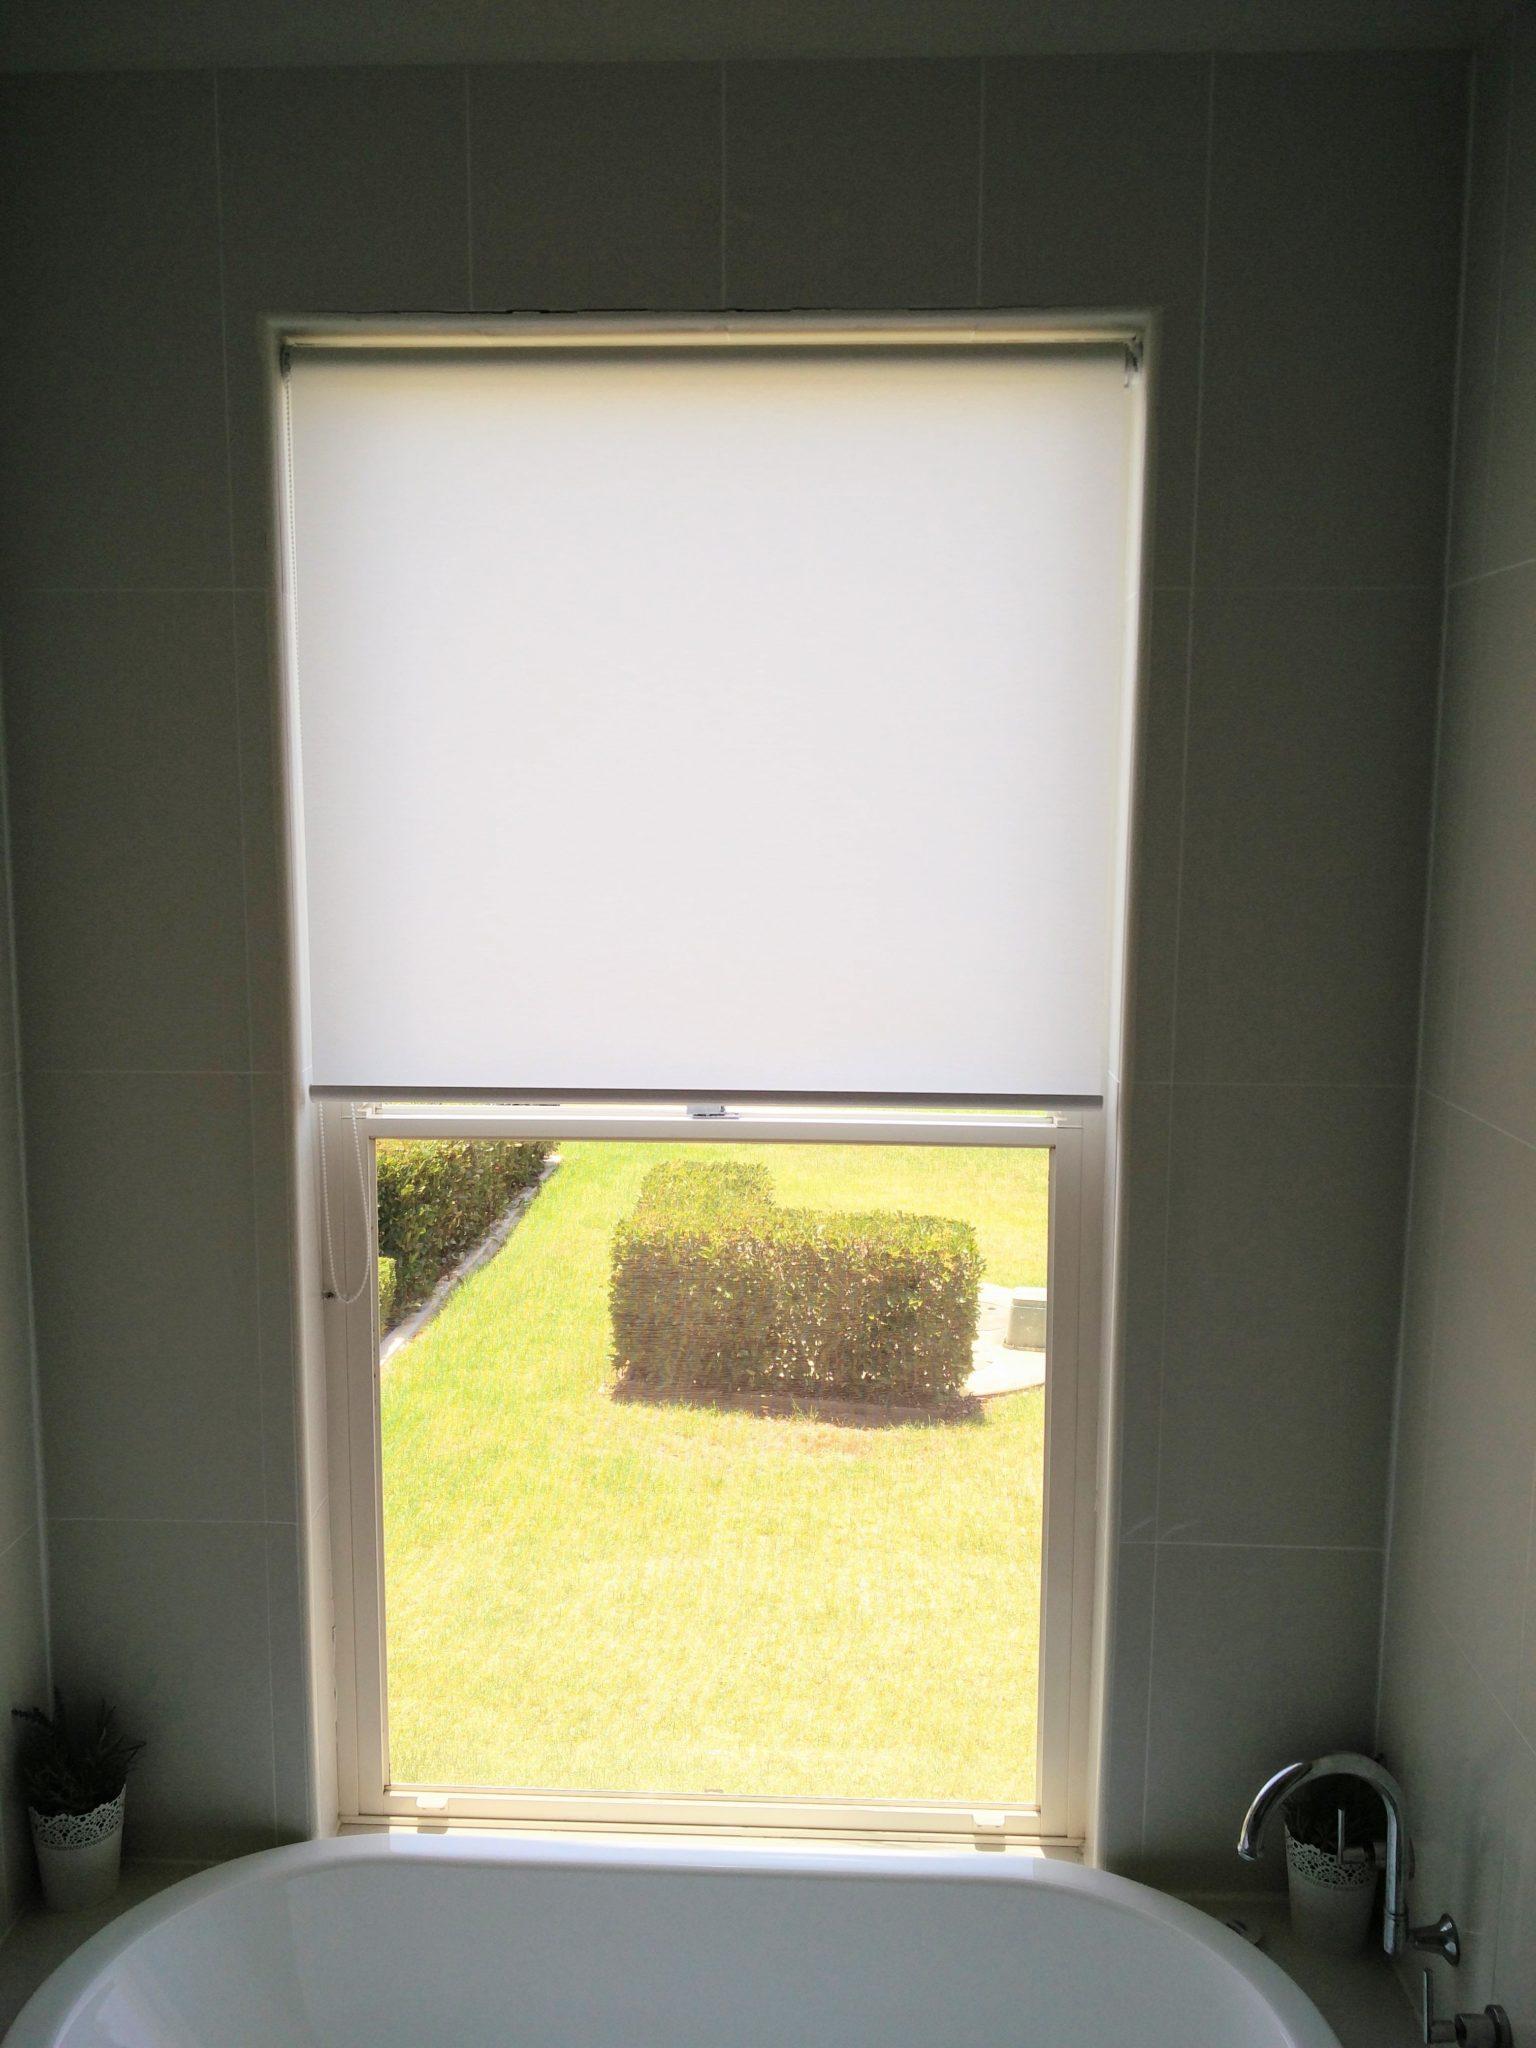 new of abca mini window abrahaml install installing door sajan fresh to how metal blinds img